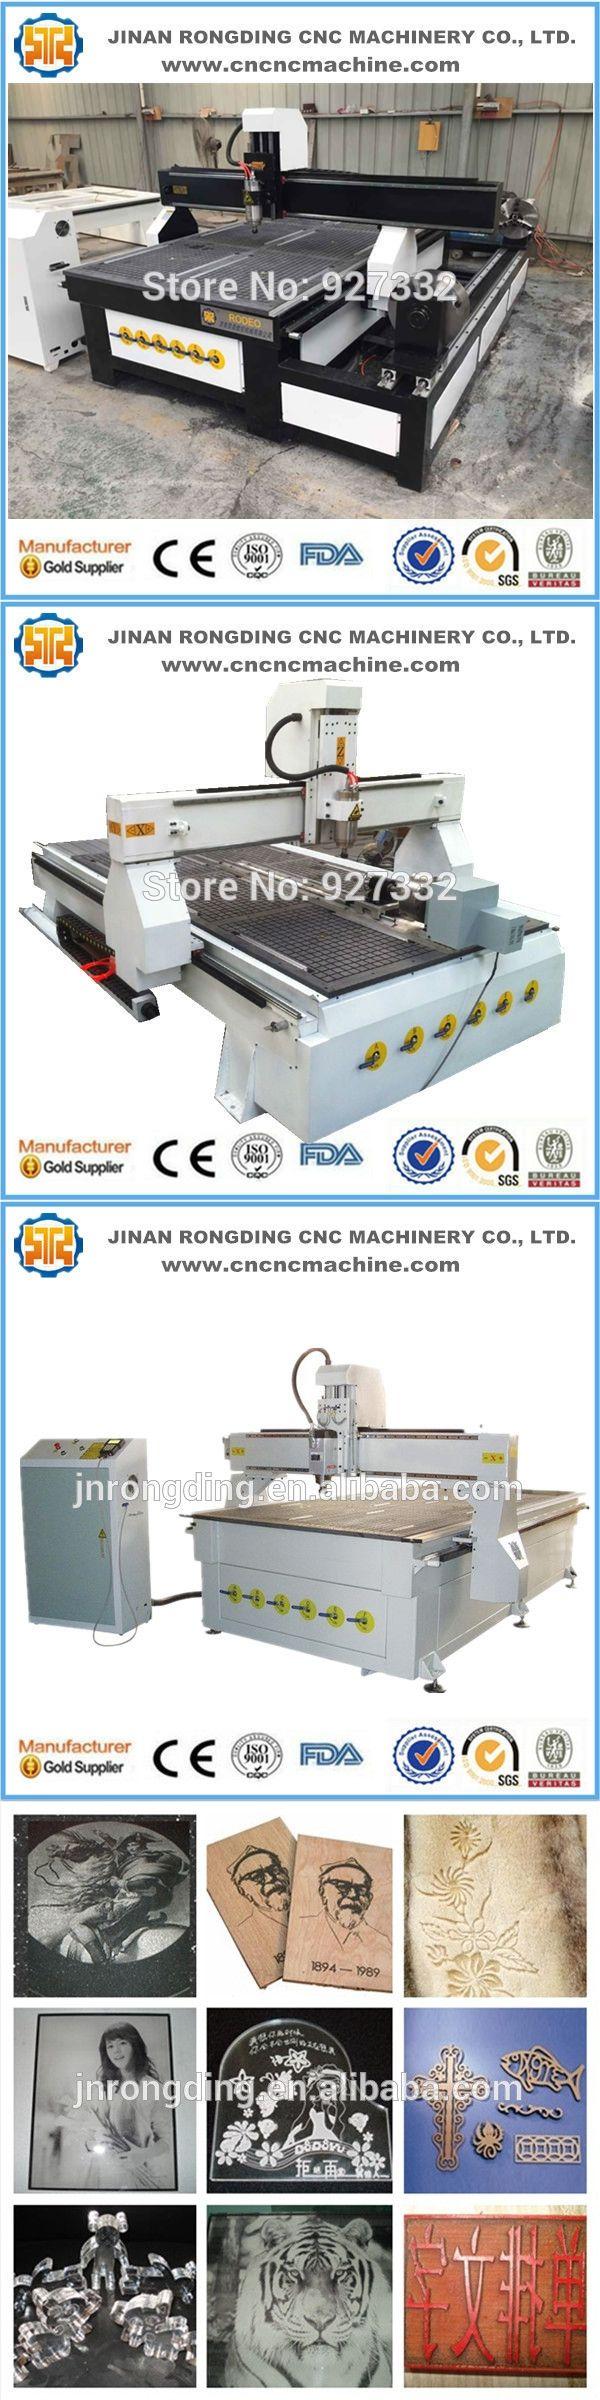 Easy control china cnc machine, wood cnc machine price, cnc wood machine